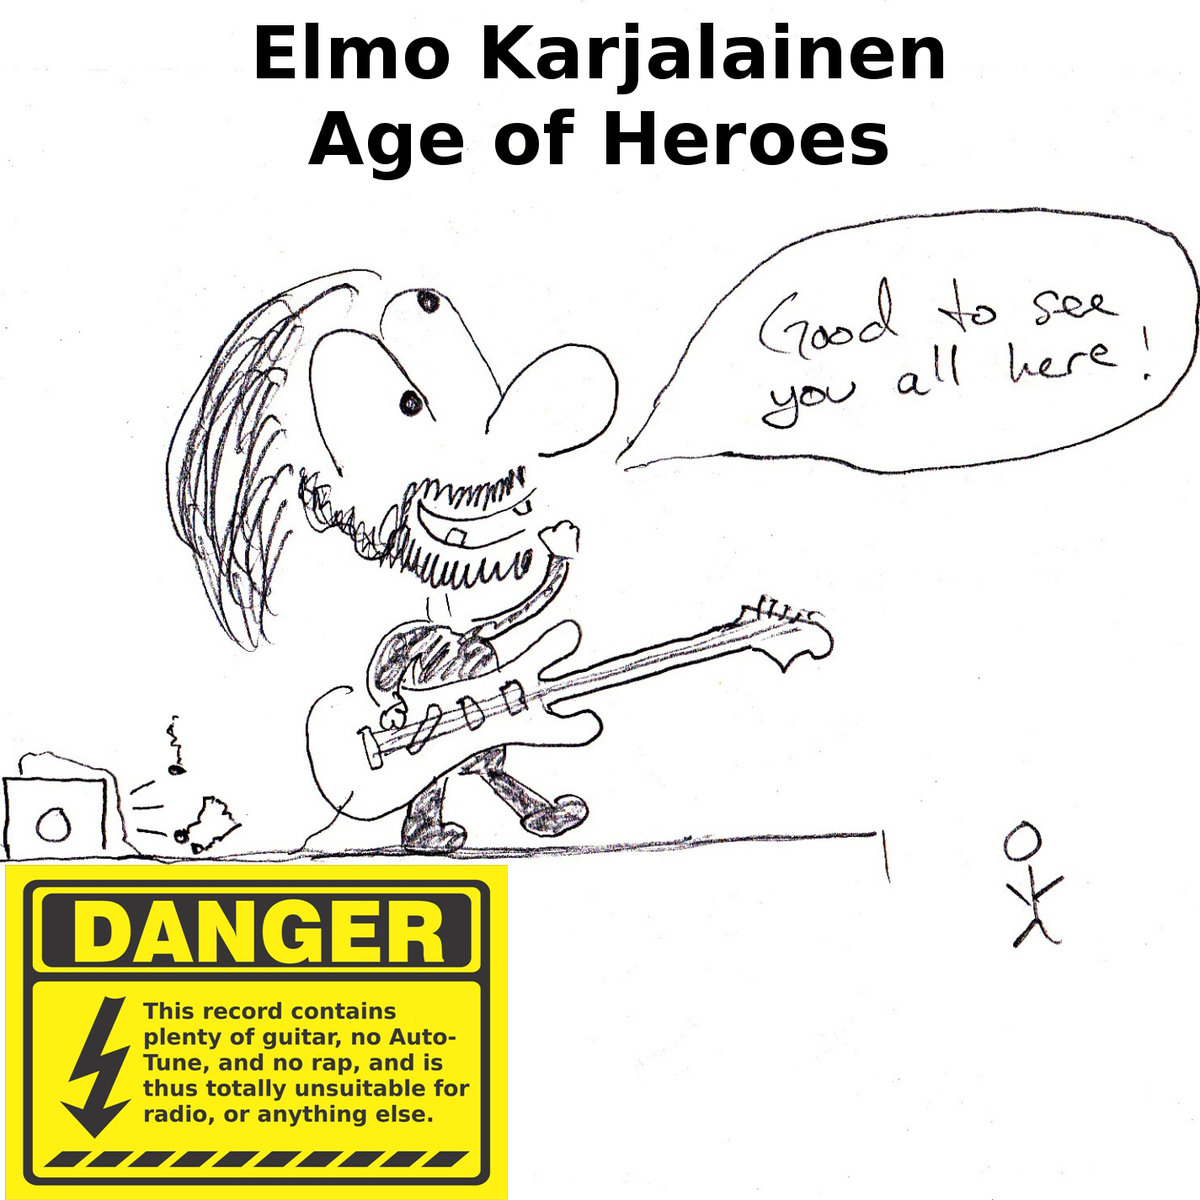 Elmo Karjalainen Age Of Heroes